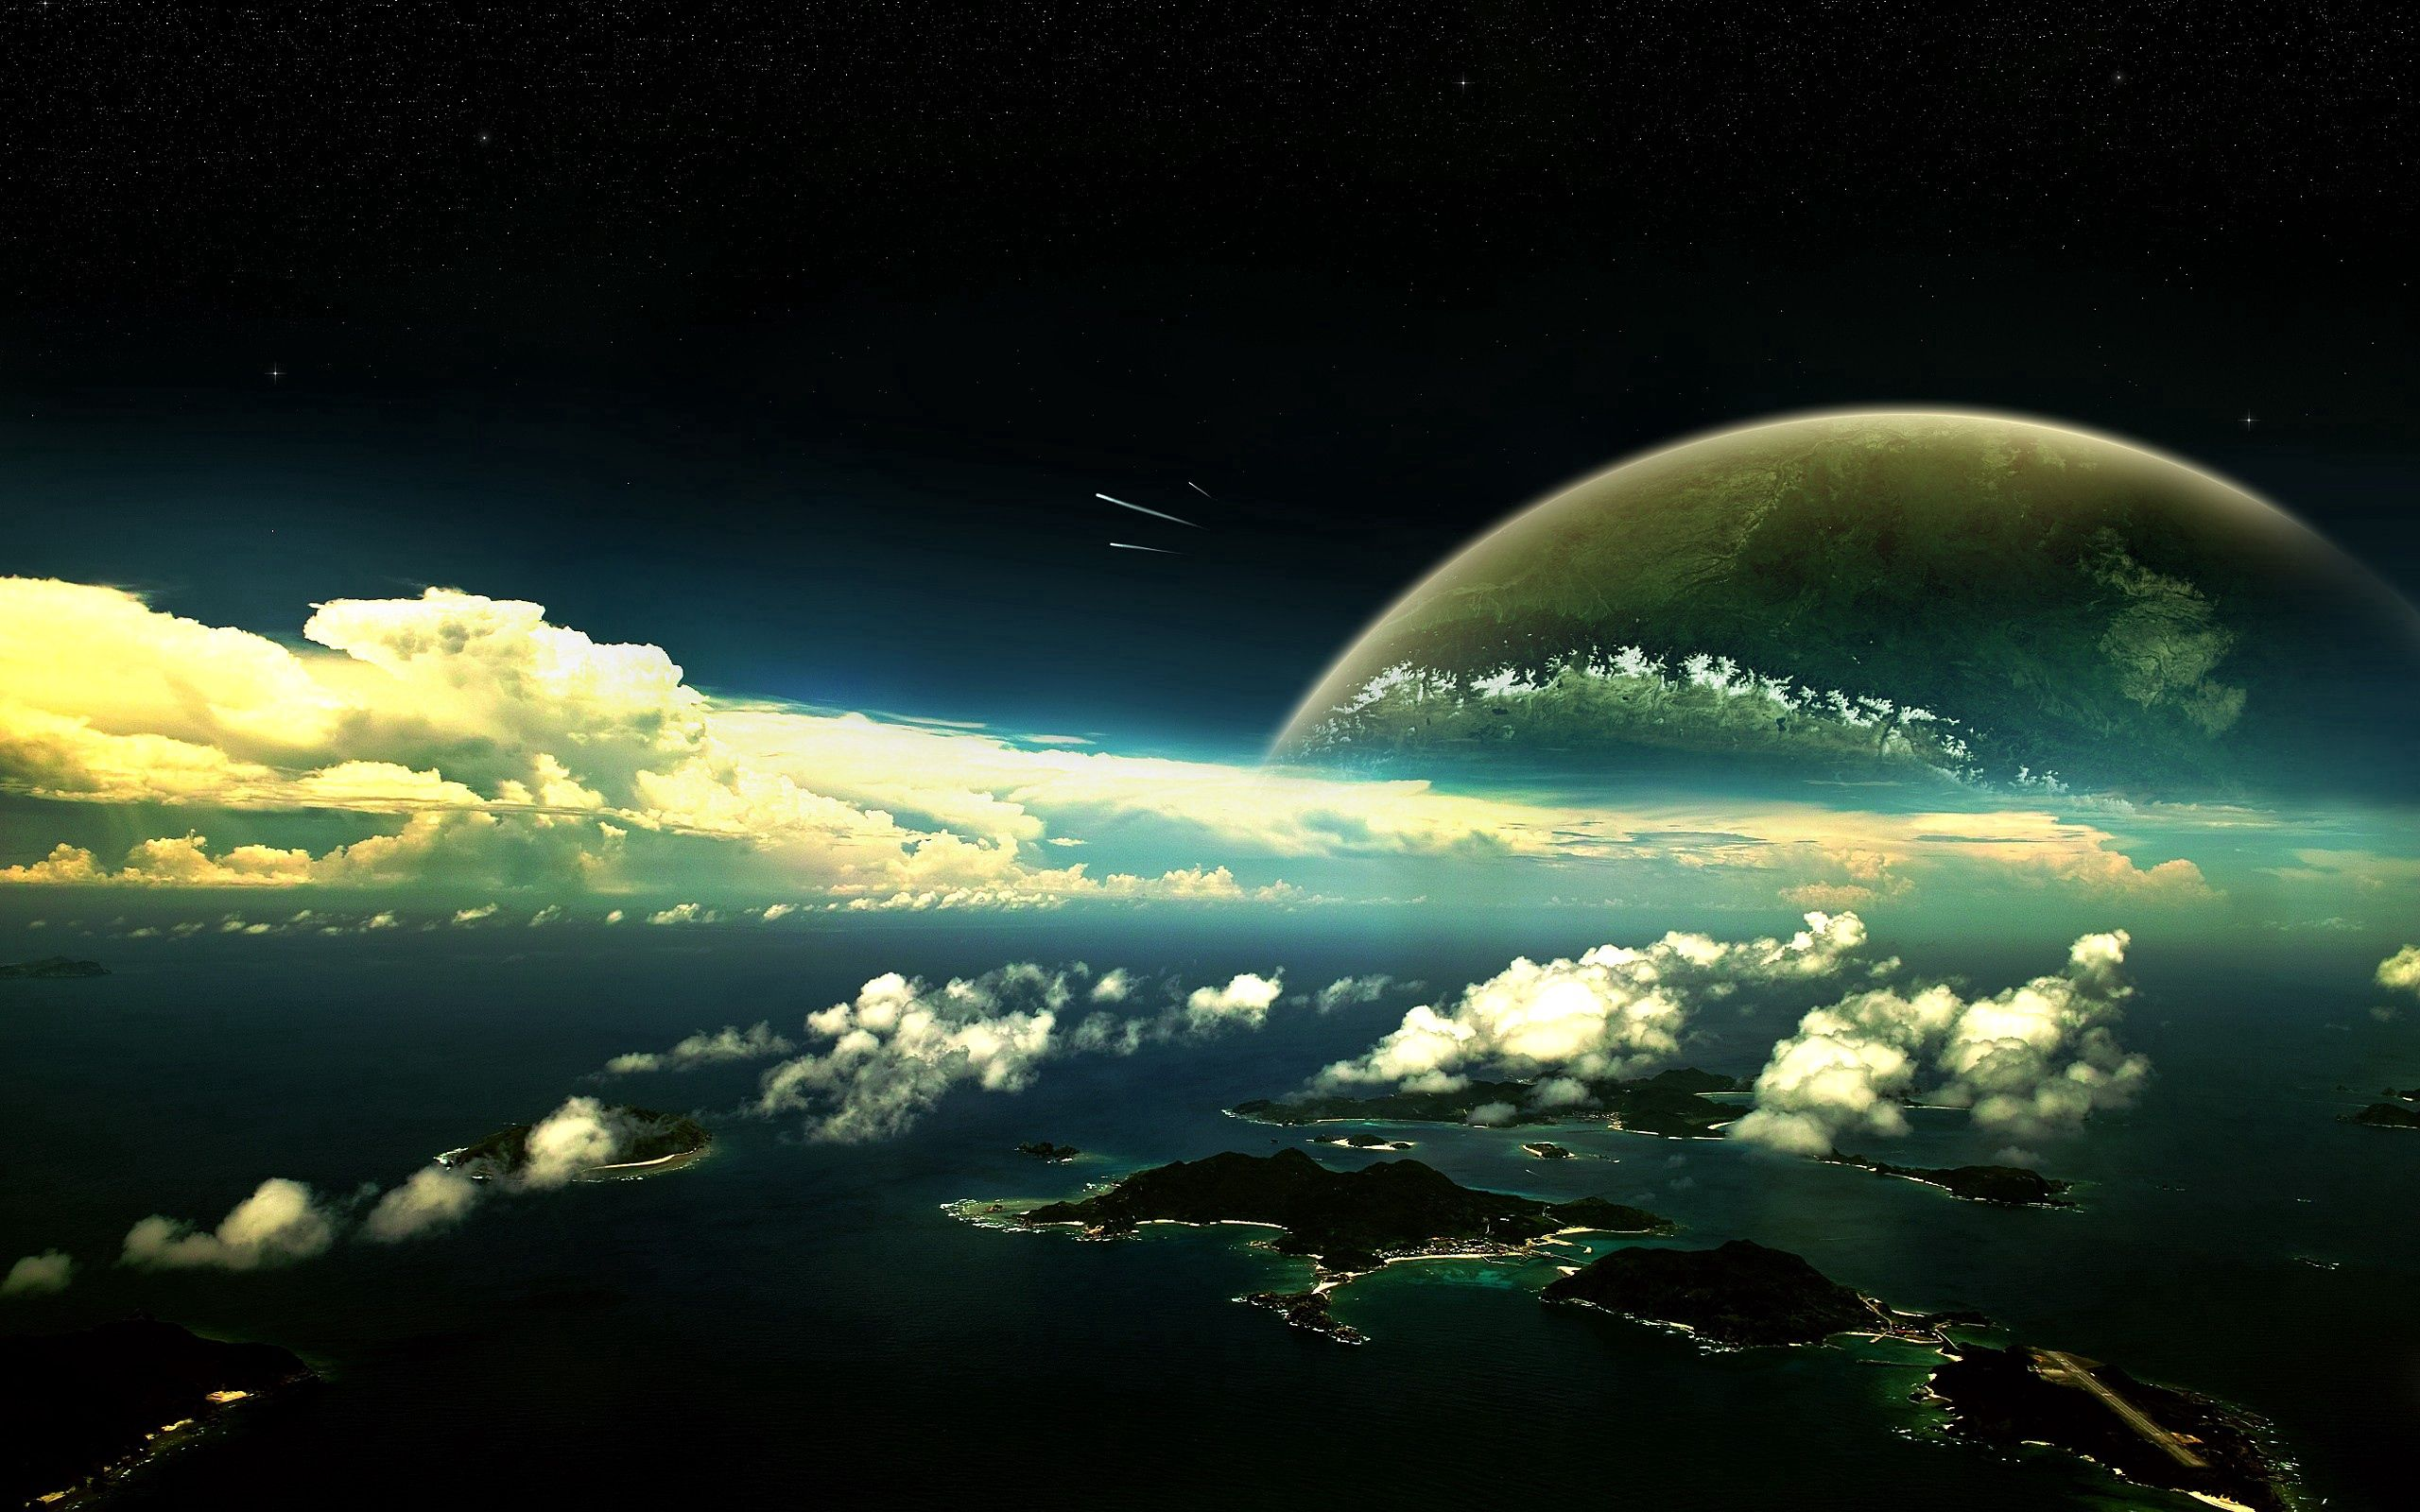 149050 скачать обои Фэнтези, Облака, Вода, Небо, Планета, Острова - заставки и картинки бесплатно